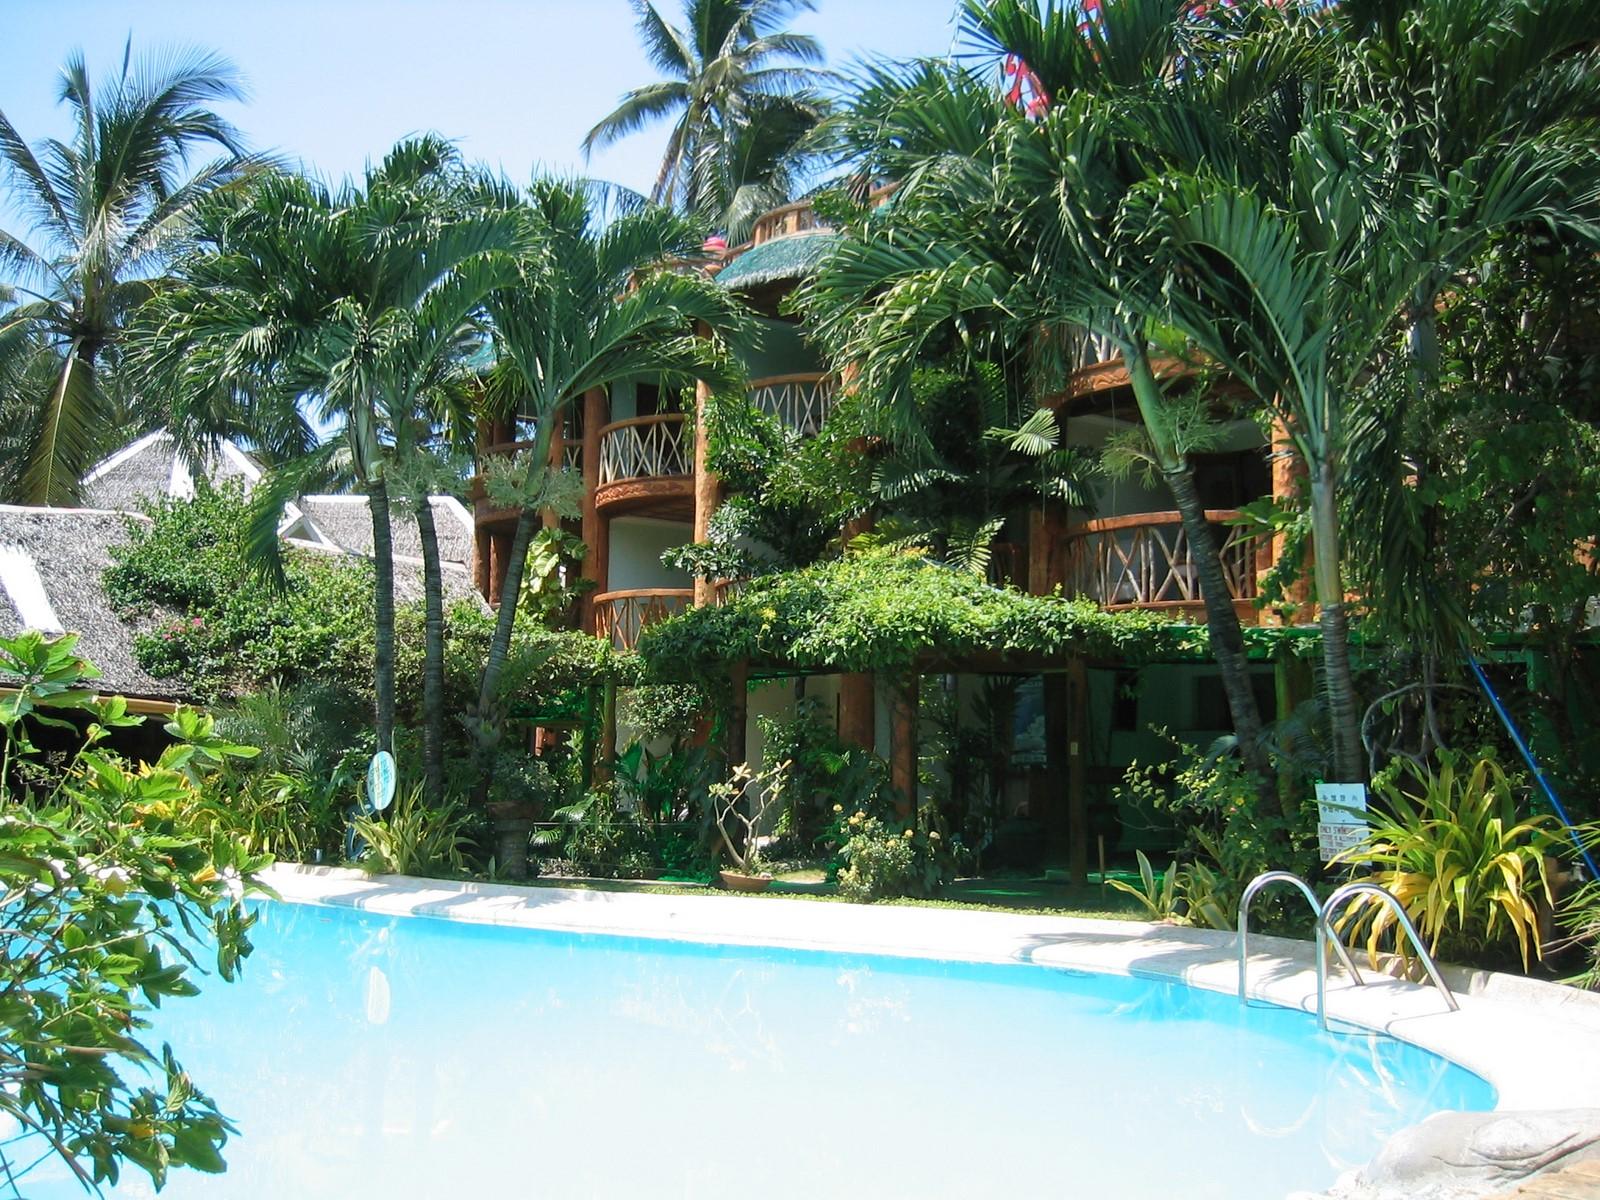 Boracay Pools